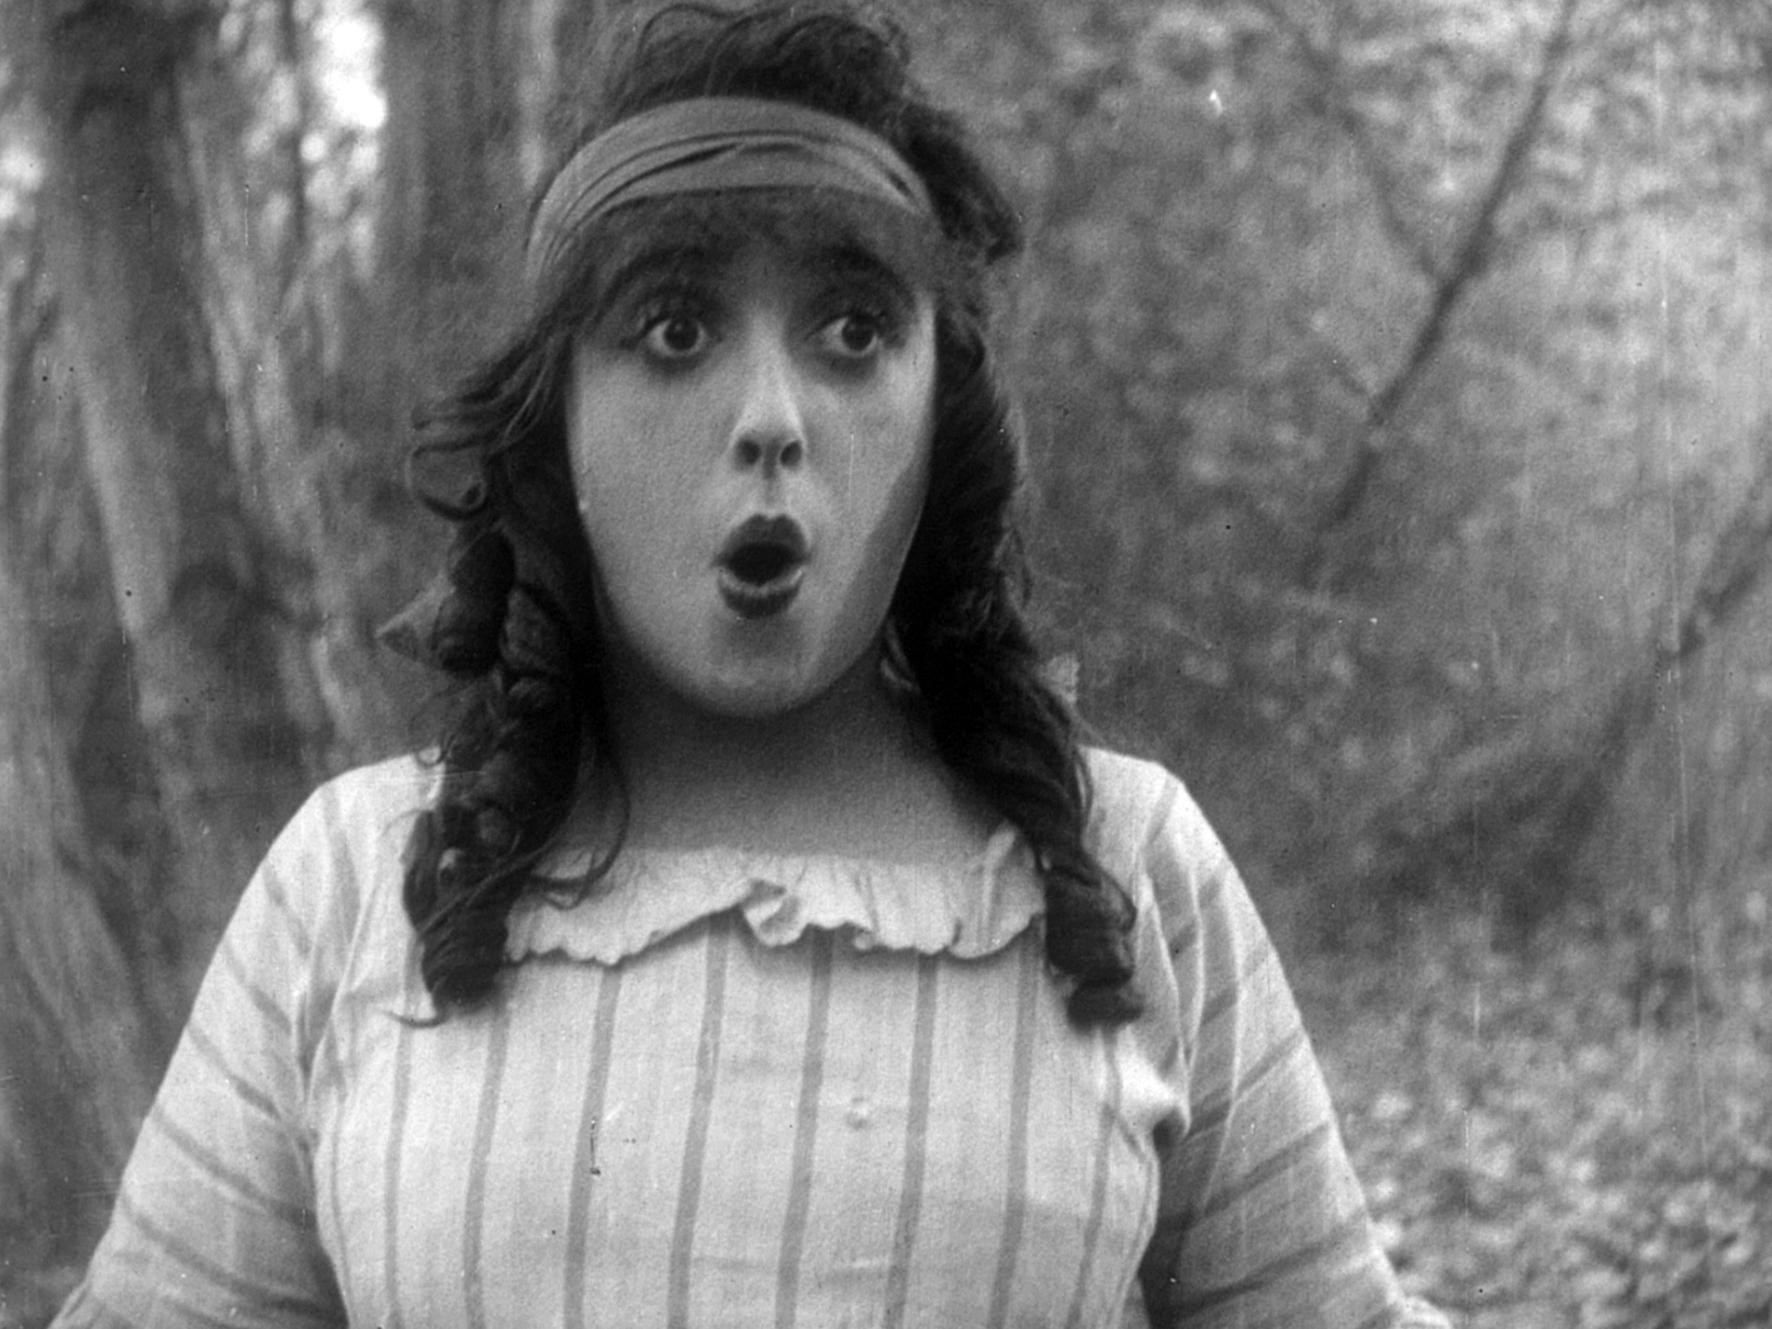 Mabel Normandová